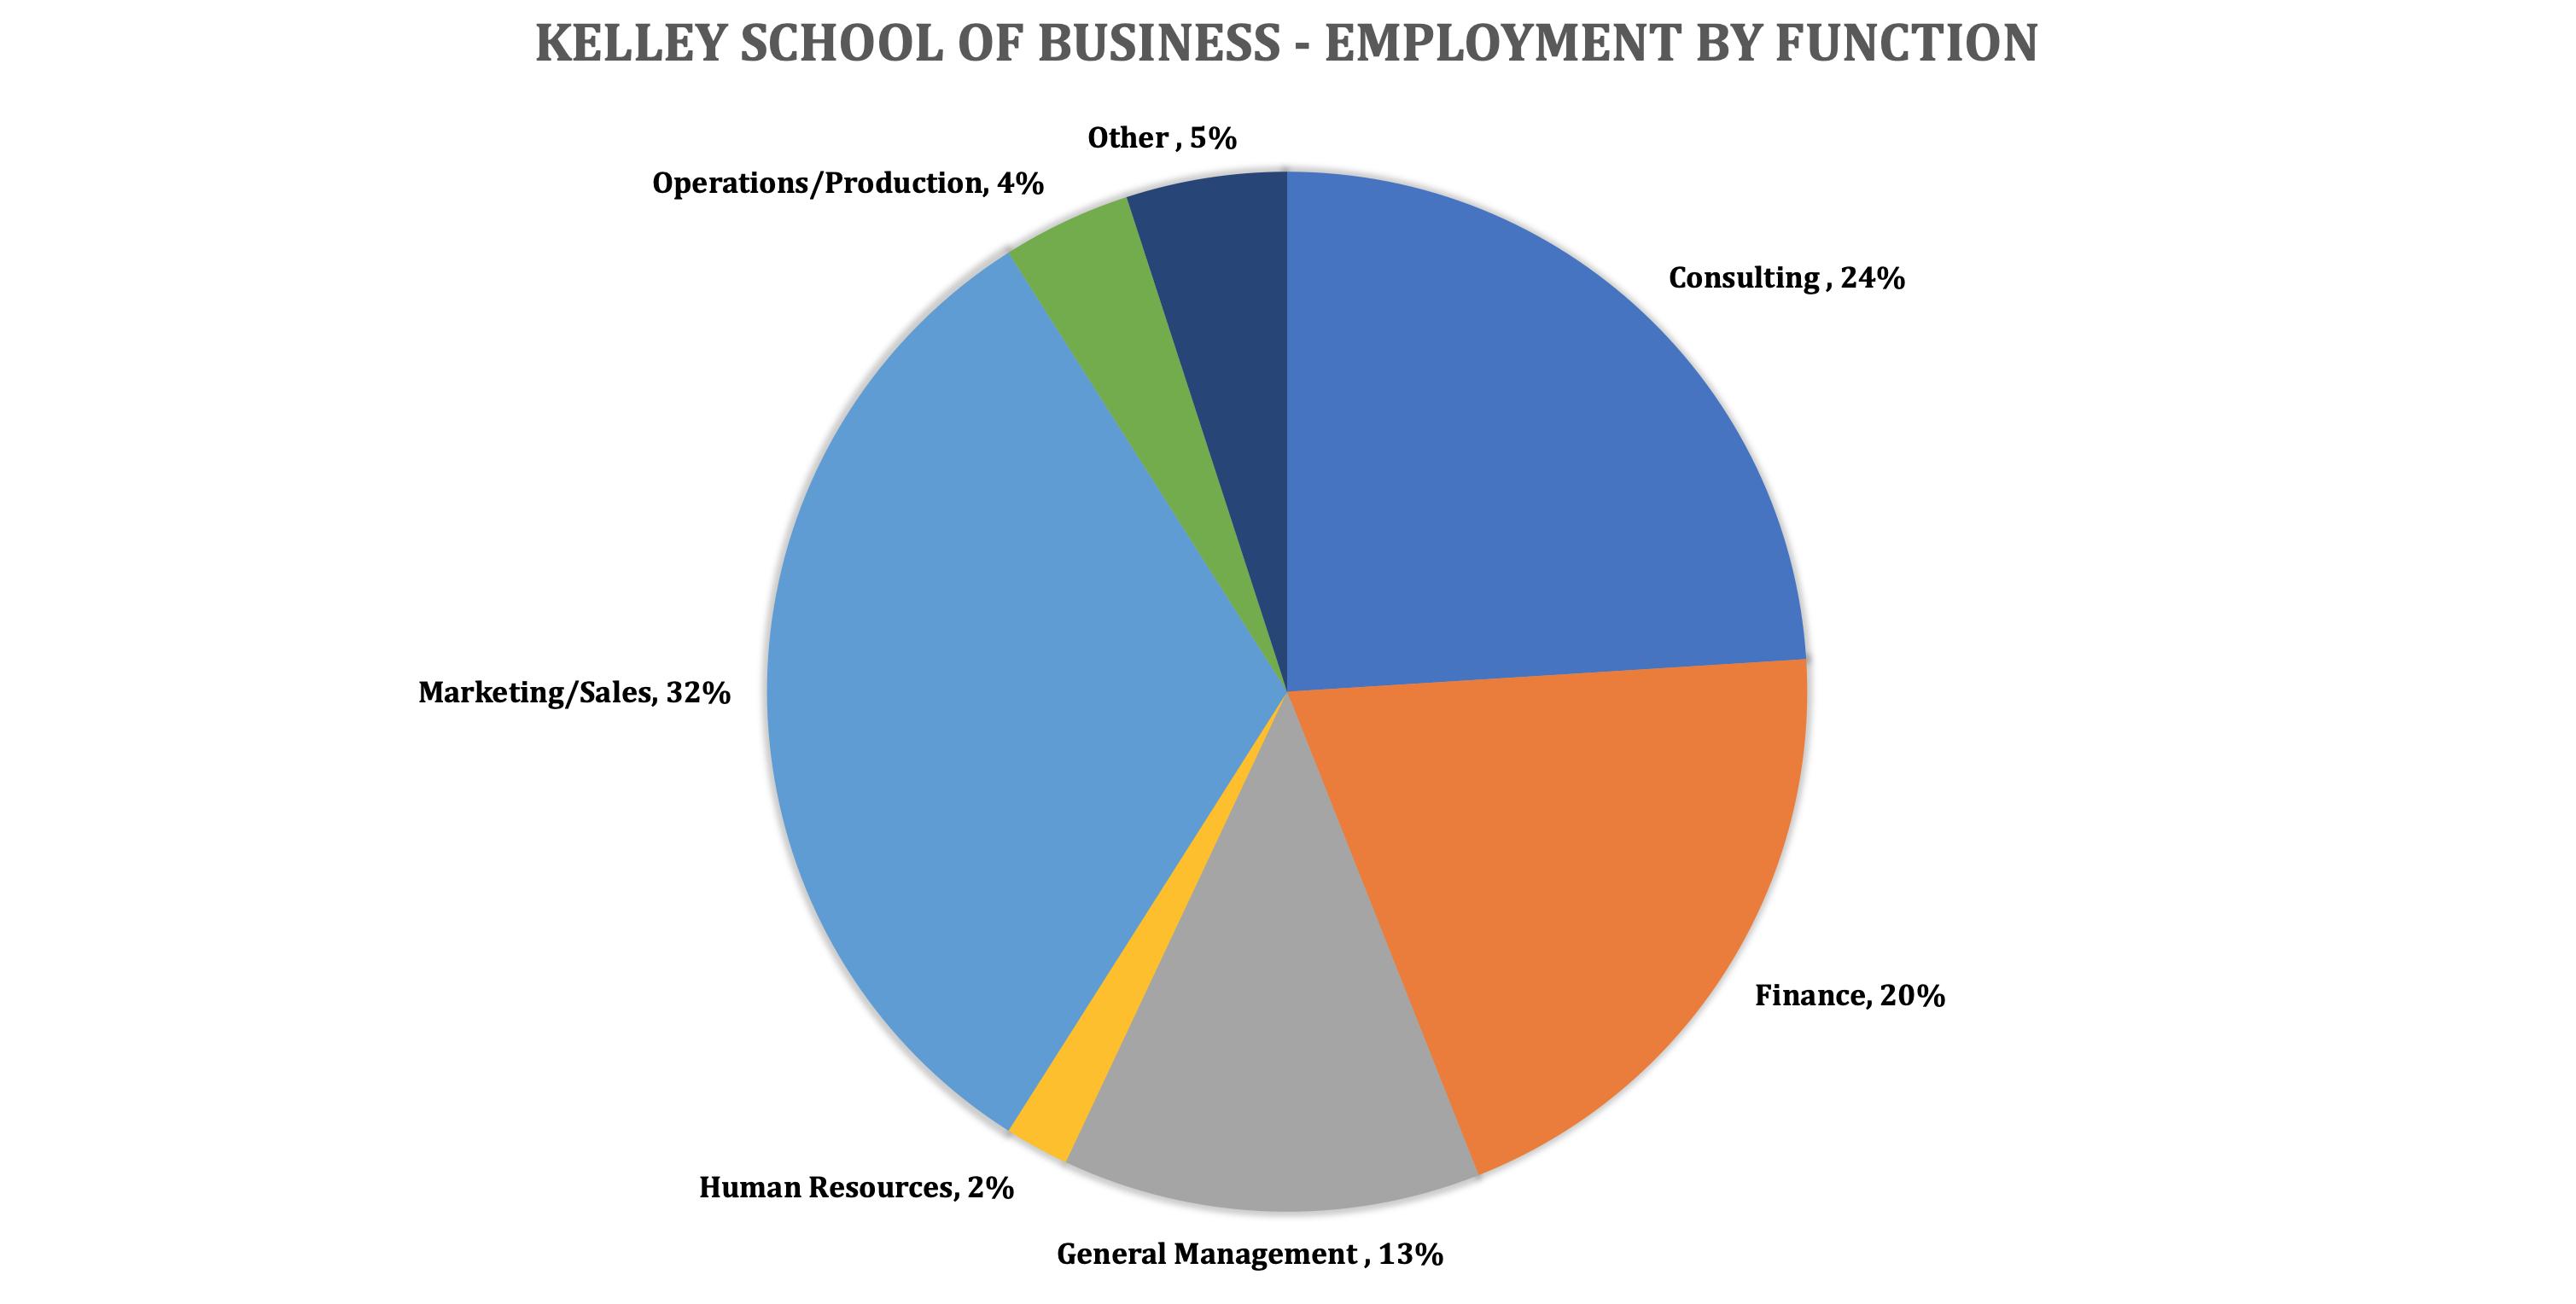 Indiana University Kelley School of Business - Kelley MBA Program - Employment by Function